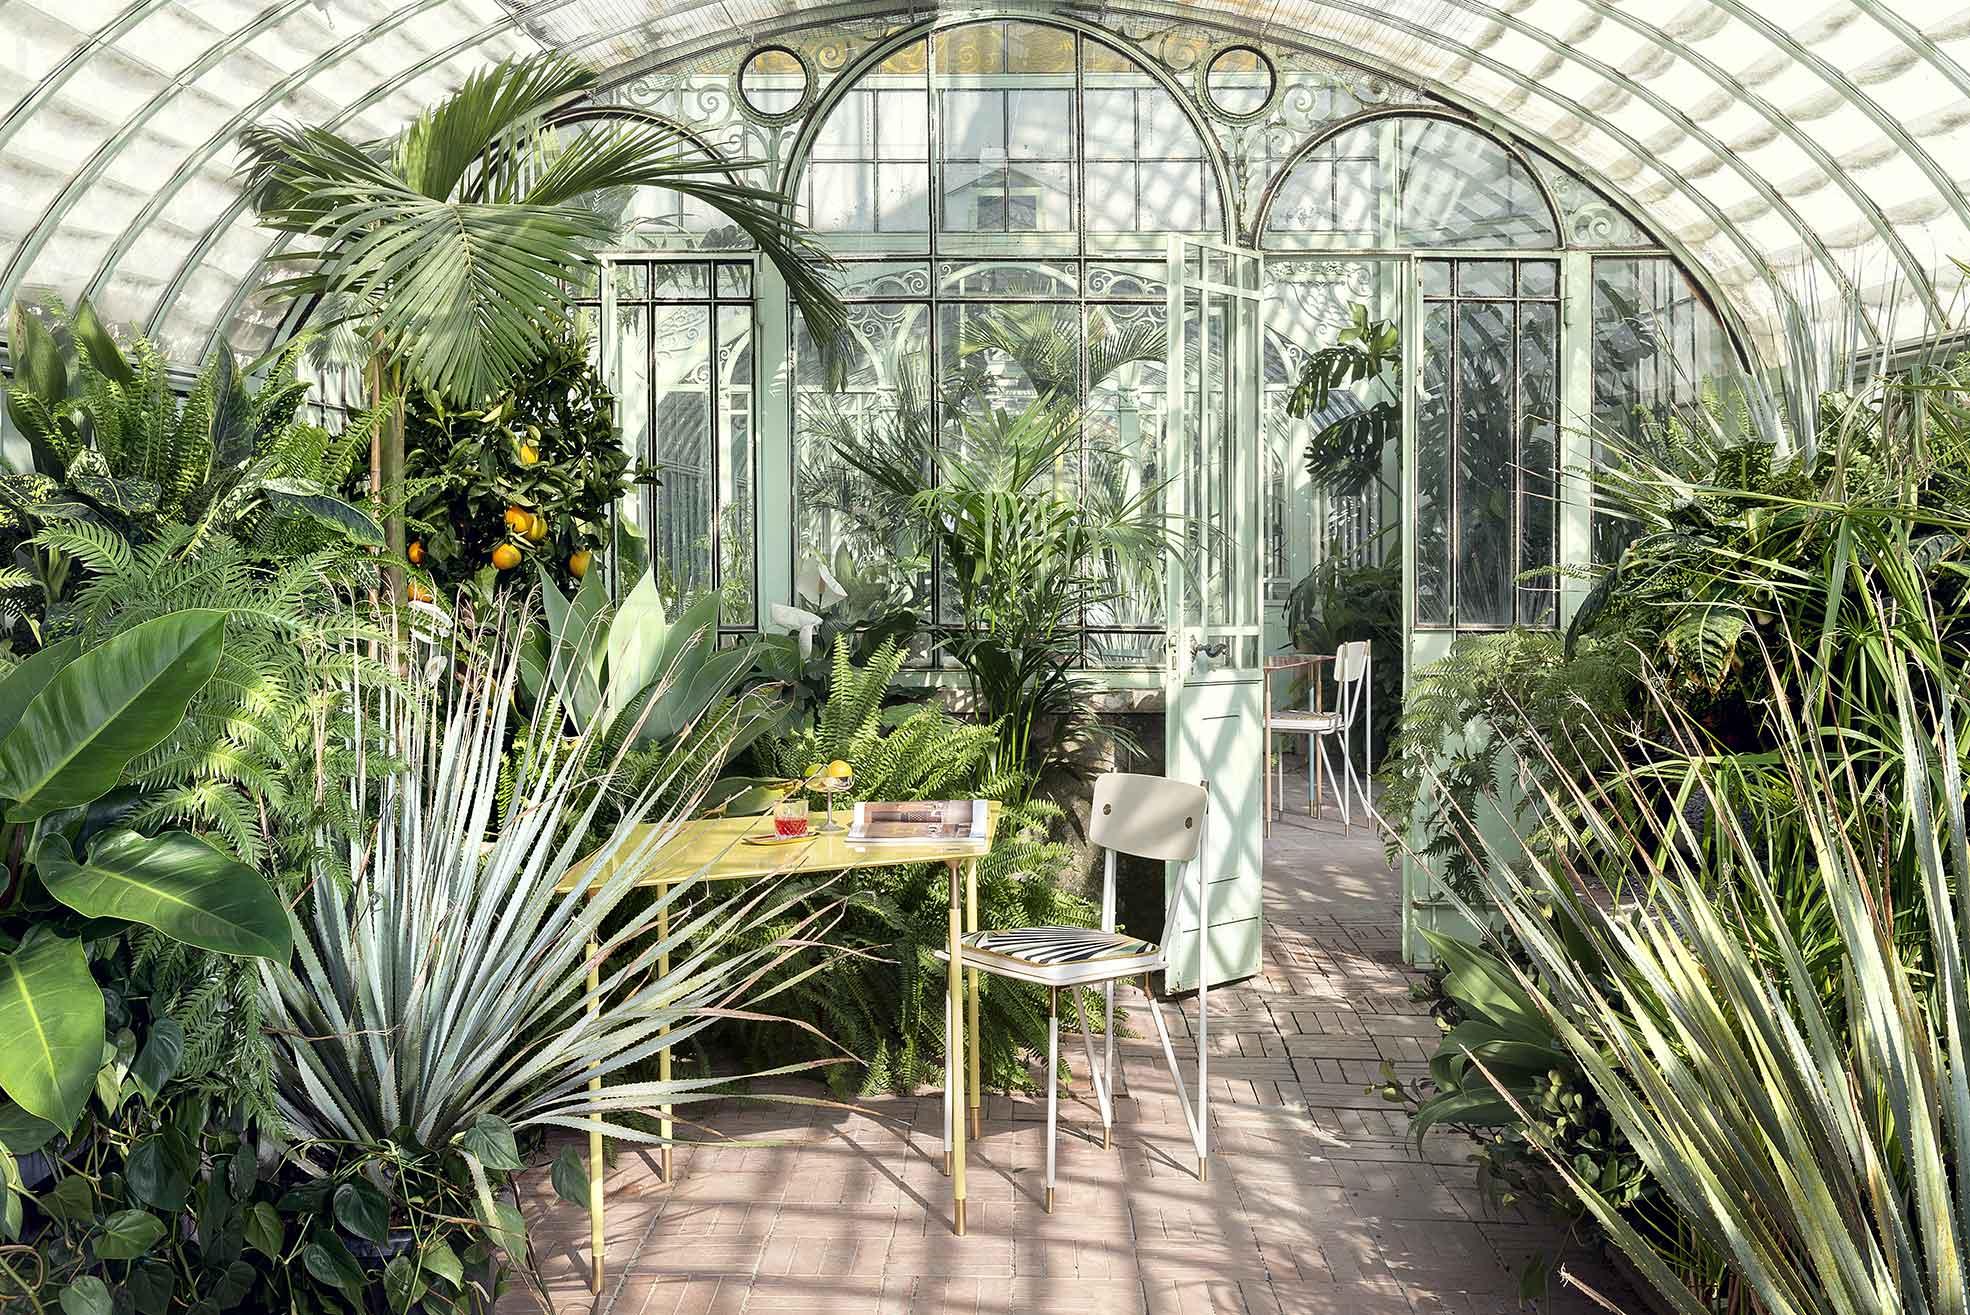 Aquiloni collection of the designer Derek Castiglioni shooted in a greenhouse for AD USA Photographer Maria Teresa Furnari